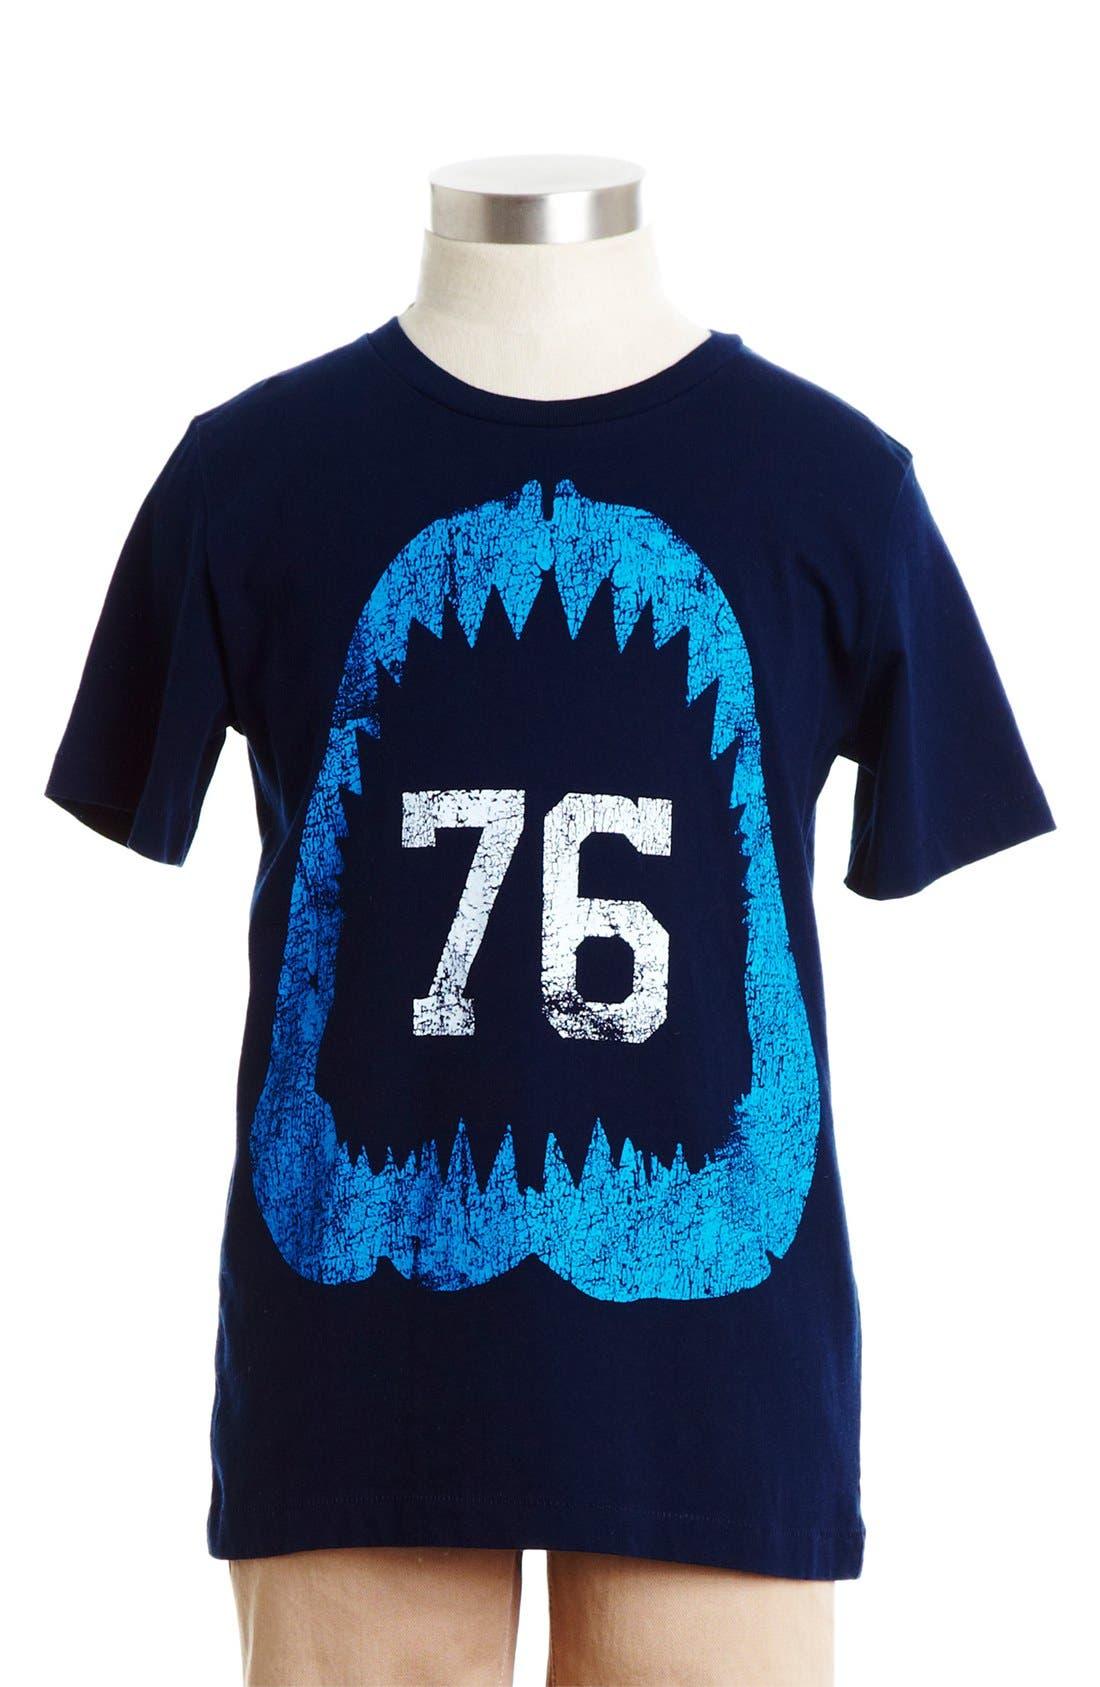 Alternate Image 1 Selected - Peek 'Chomp Shark' Cotton T-Shirt (Toddler Boys, Little Boys & Big Boys)